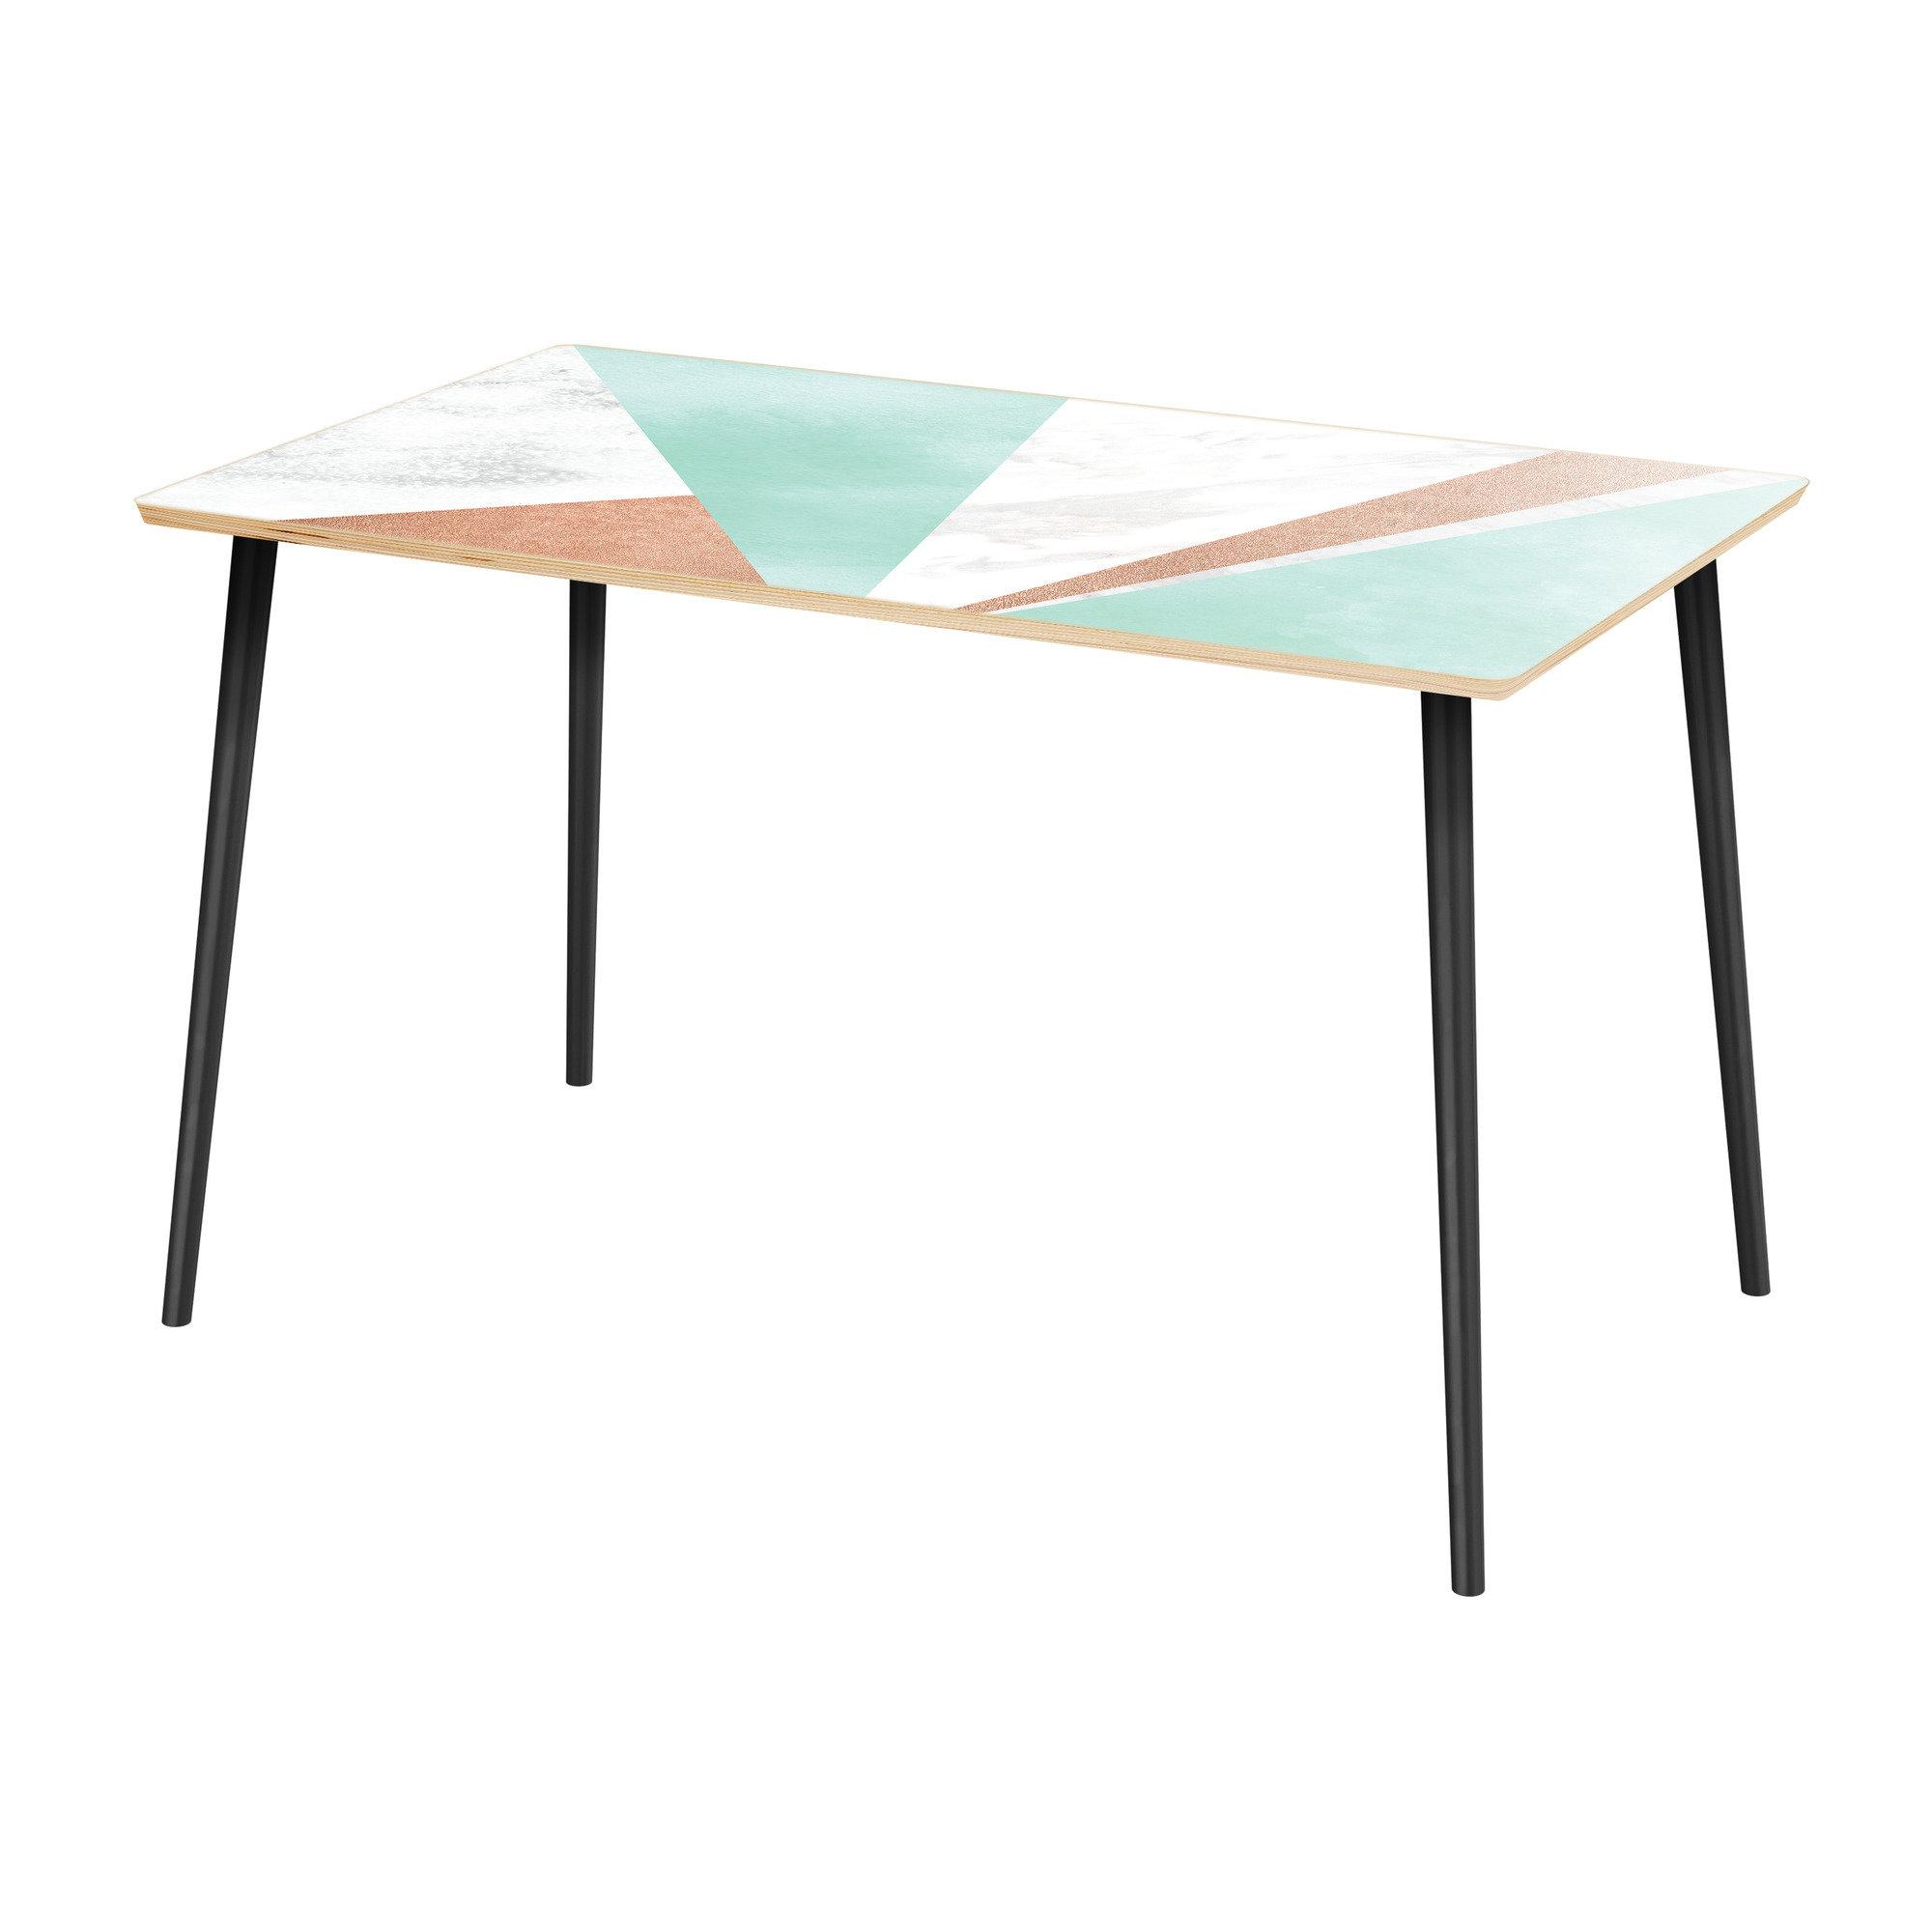 Reinert 5 Piece Dining Sets Inside 2020 Wrought Studio Hageman Dining Table (View 13 of 25)